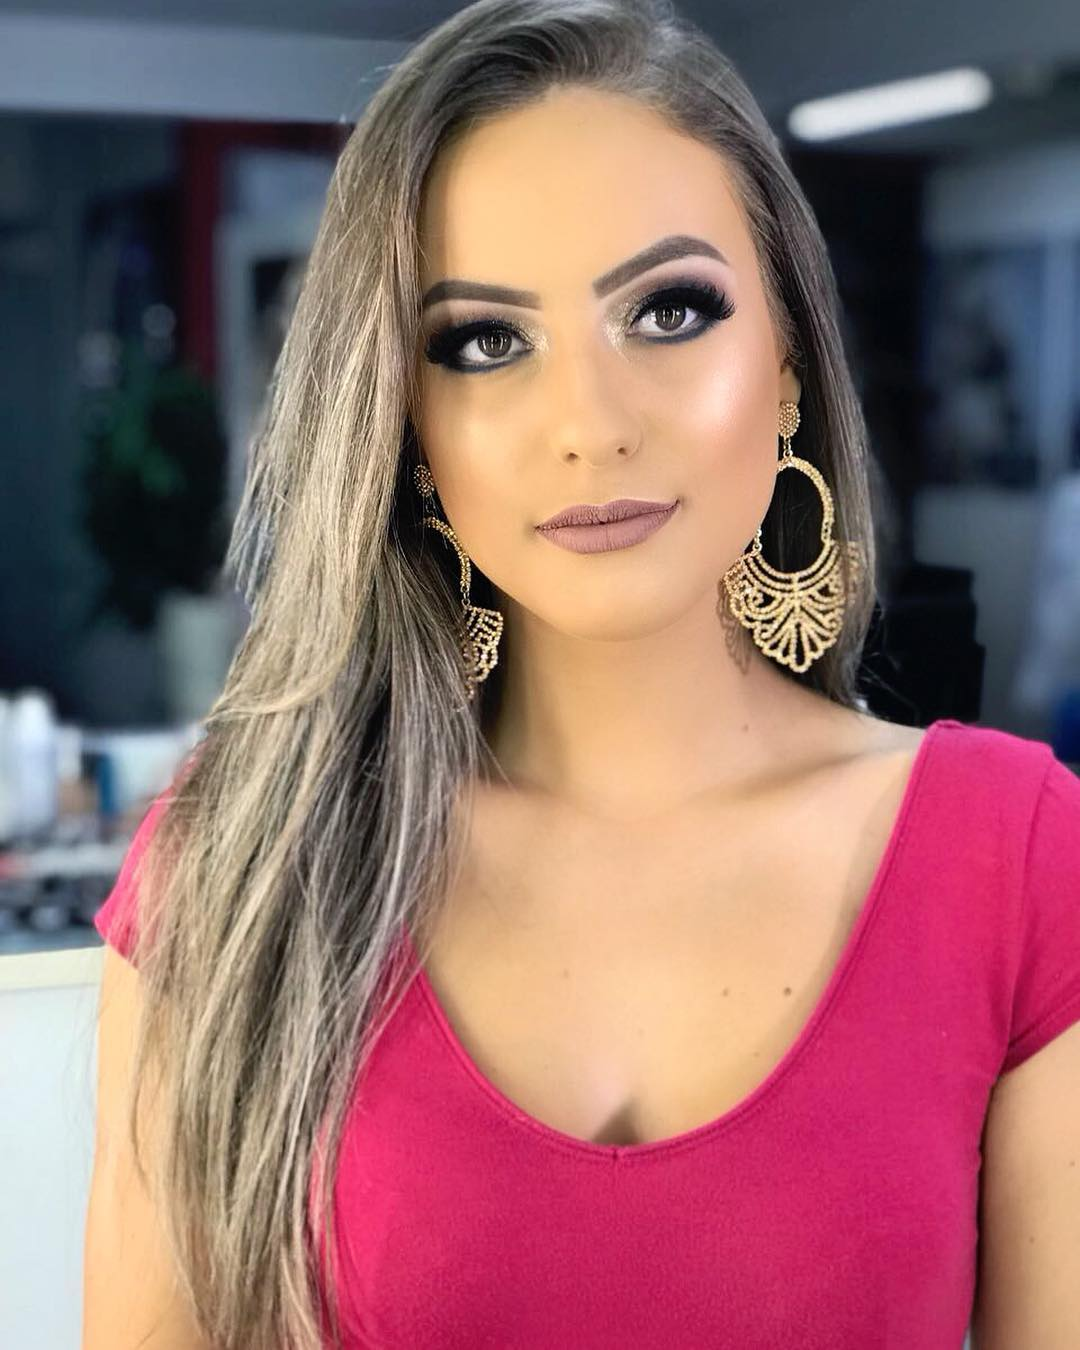 cristine boff sartor, segunda finalista de miss latinoamerica 2019. - Página 2 29088010